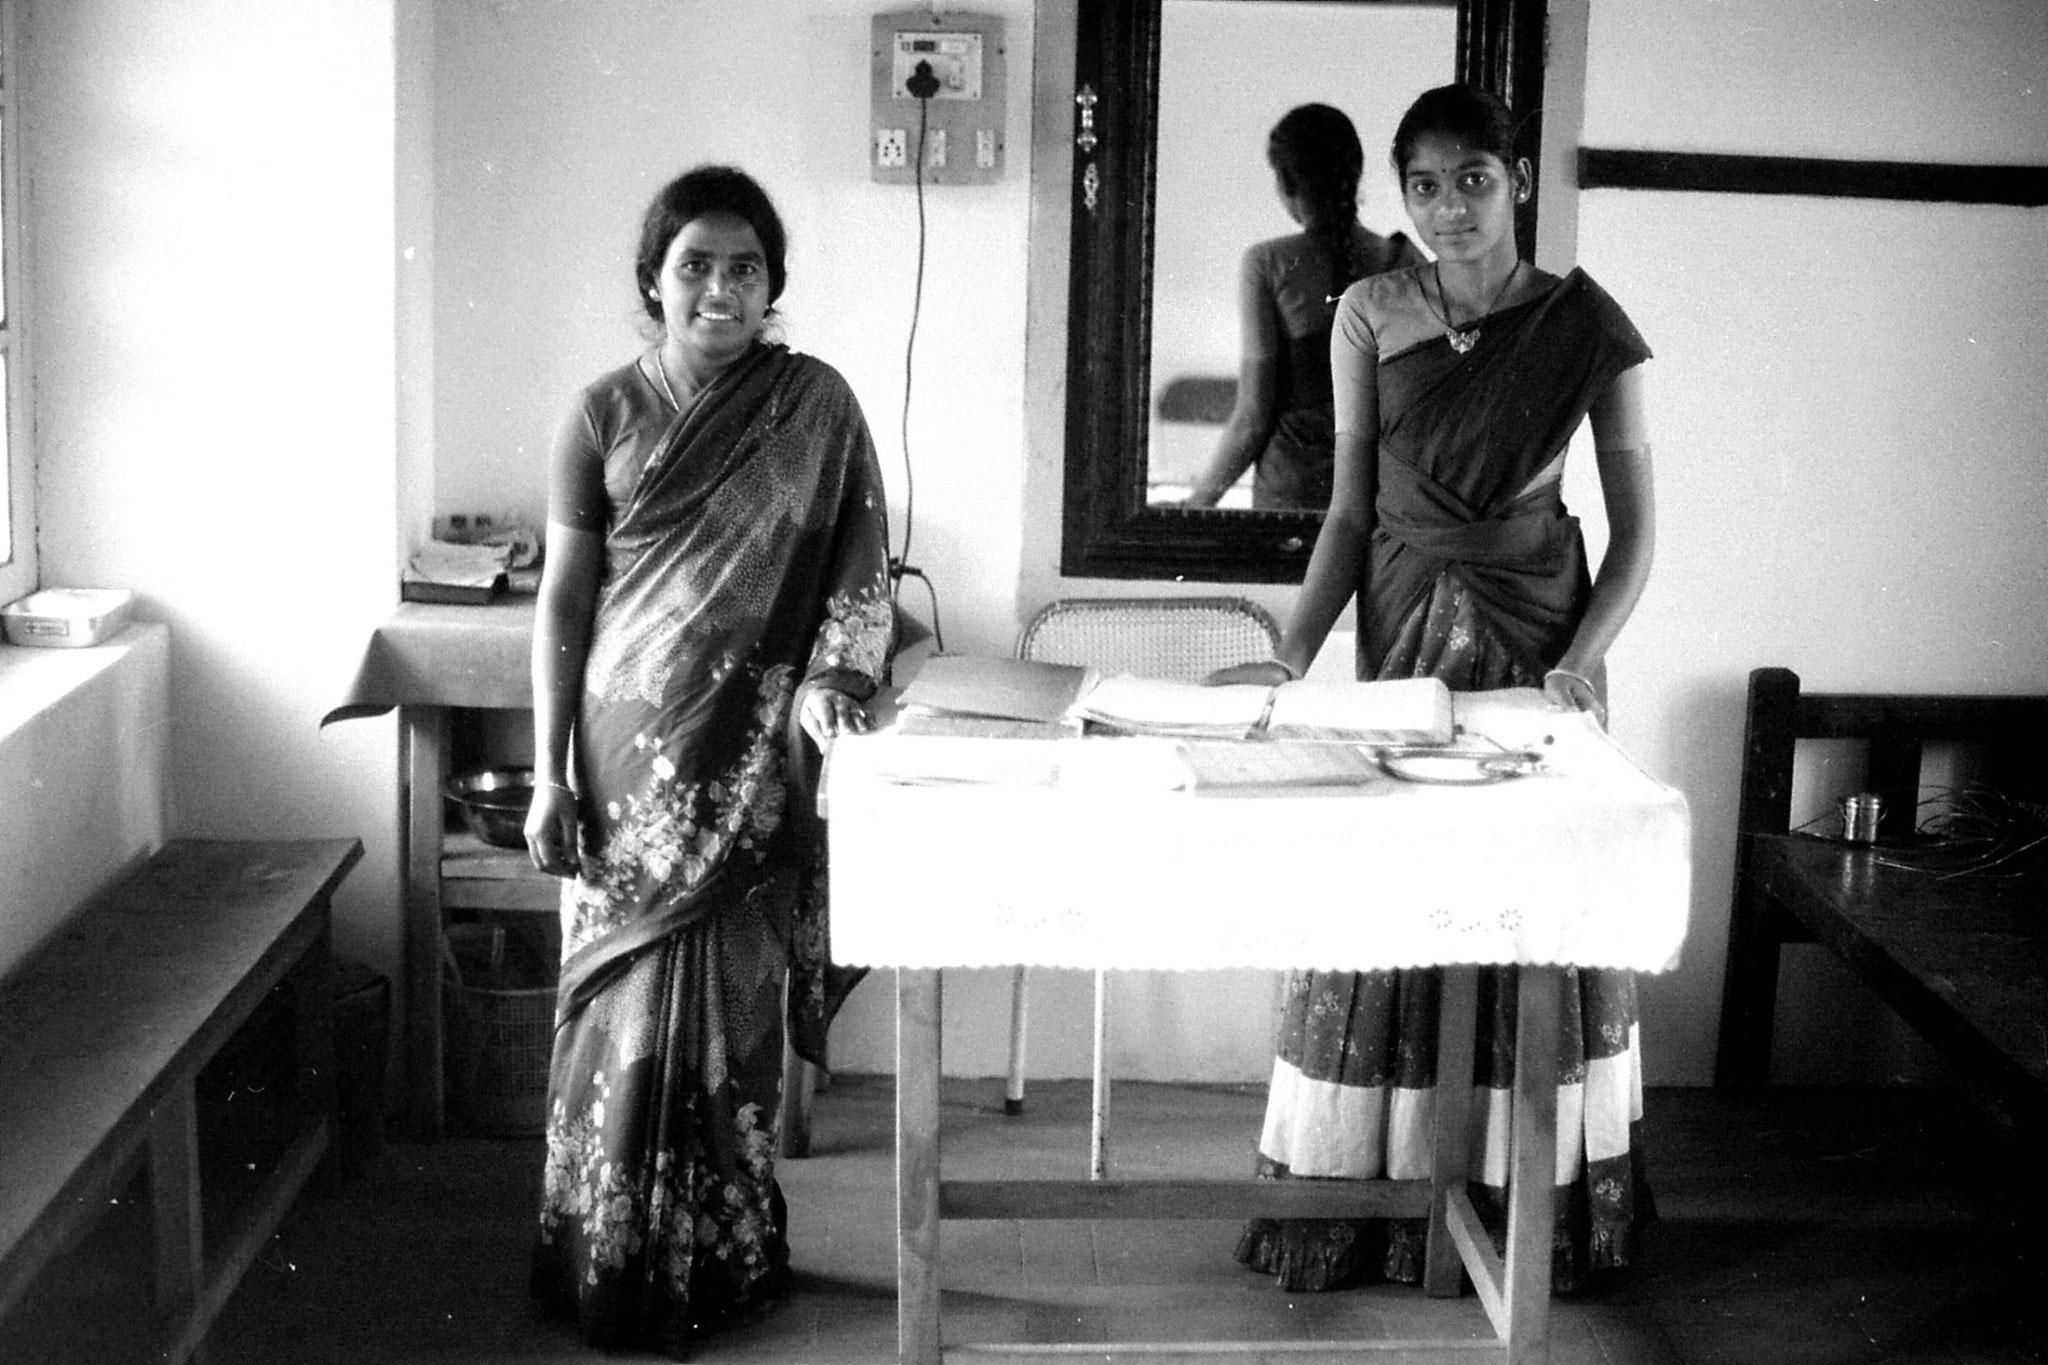 19/2/1990: 12: Vilpatti nurse and assistant